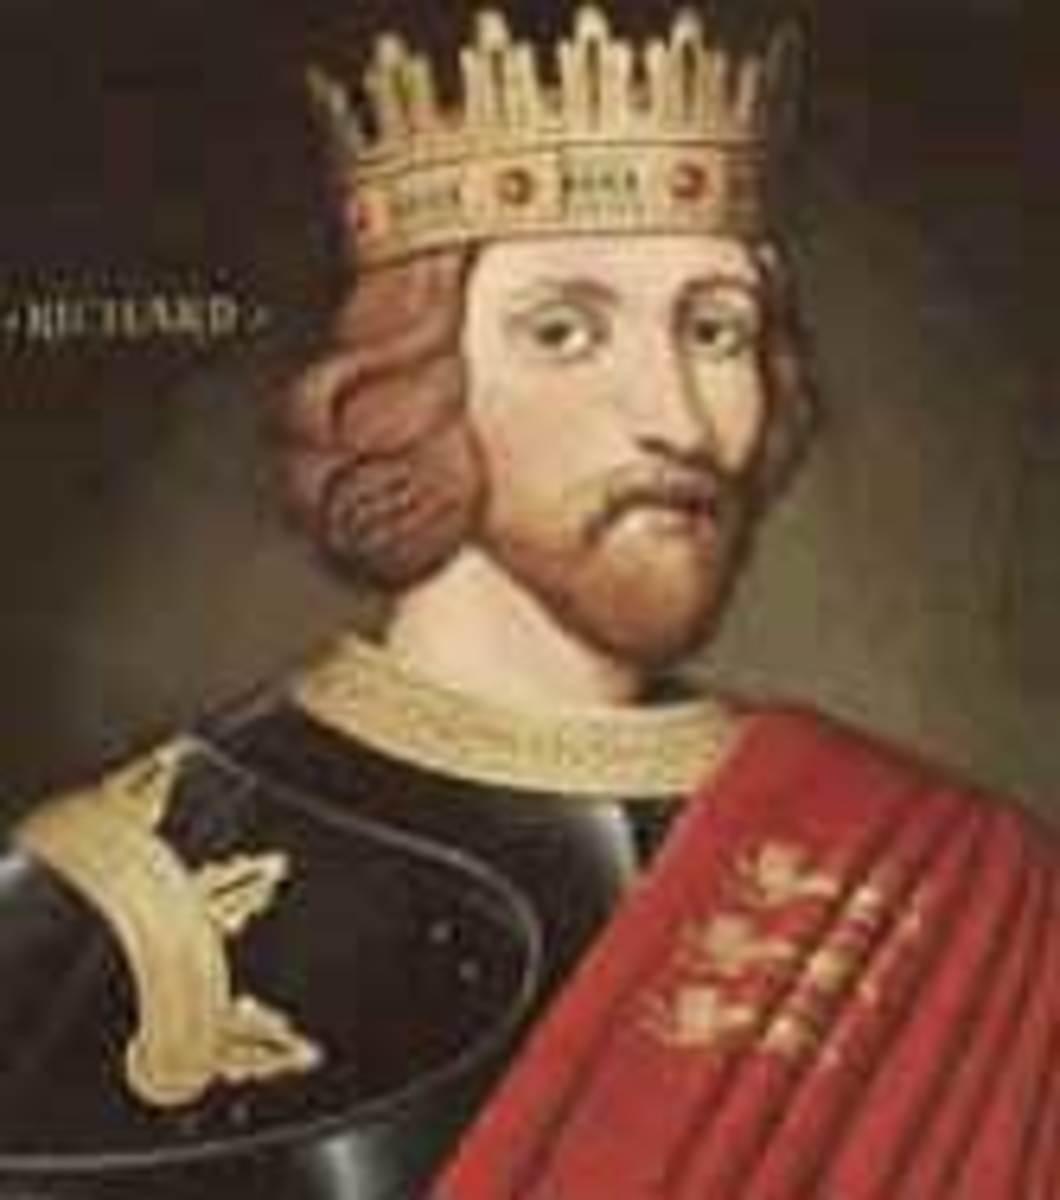 Richard I, Richard the Lionheart, King of England (1189-1199)